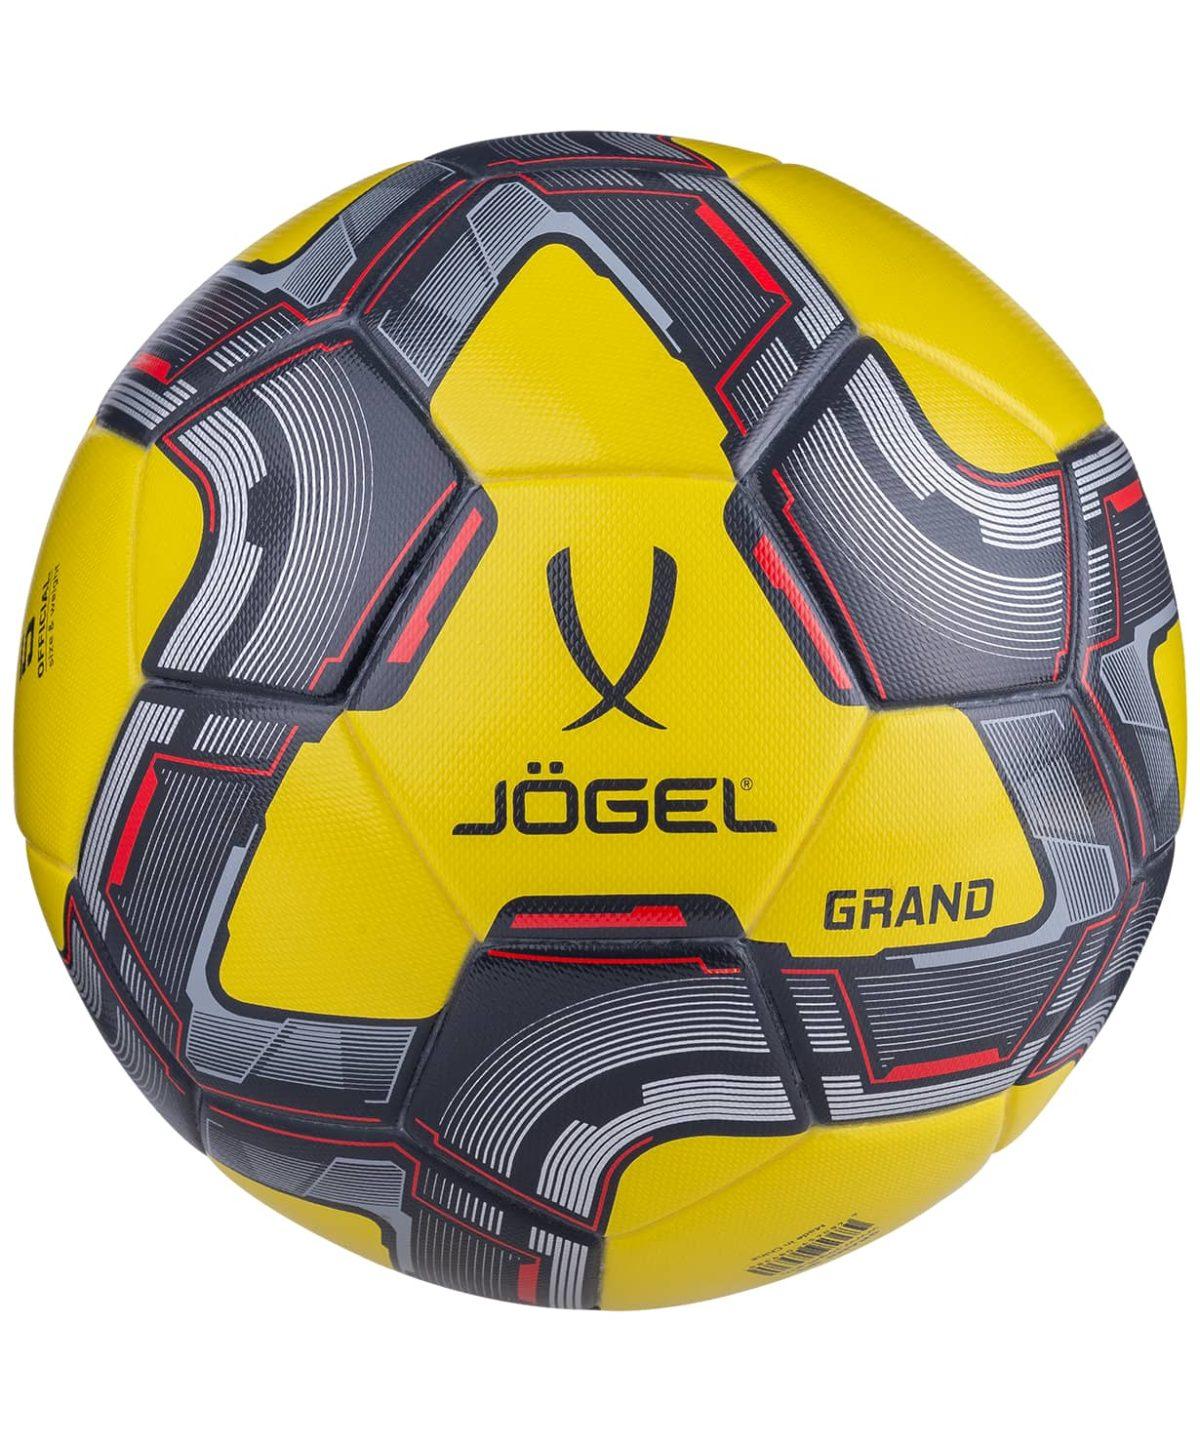 JOGEL Grand Мяч футбольный  Grand №5 (BC20) - 1